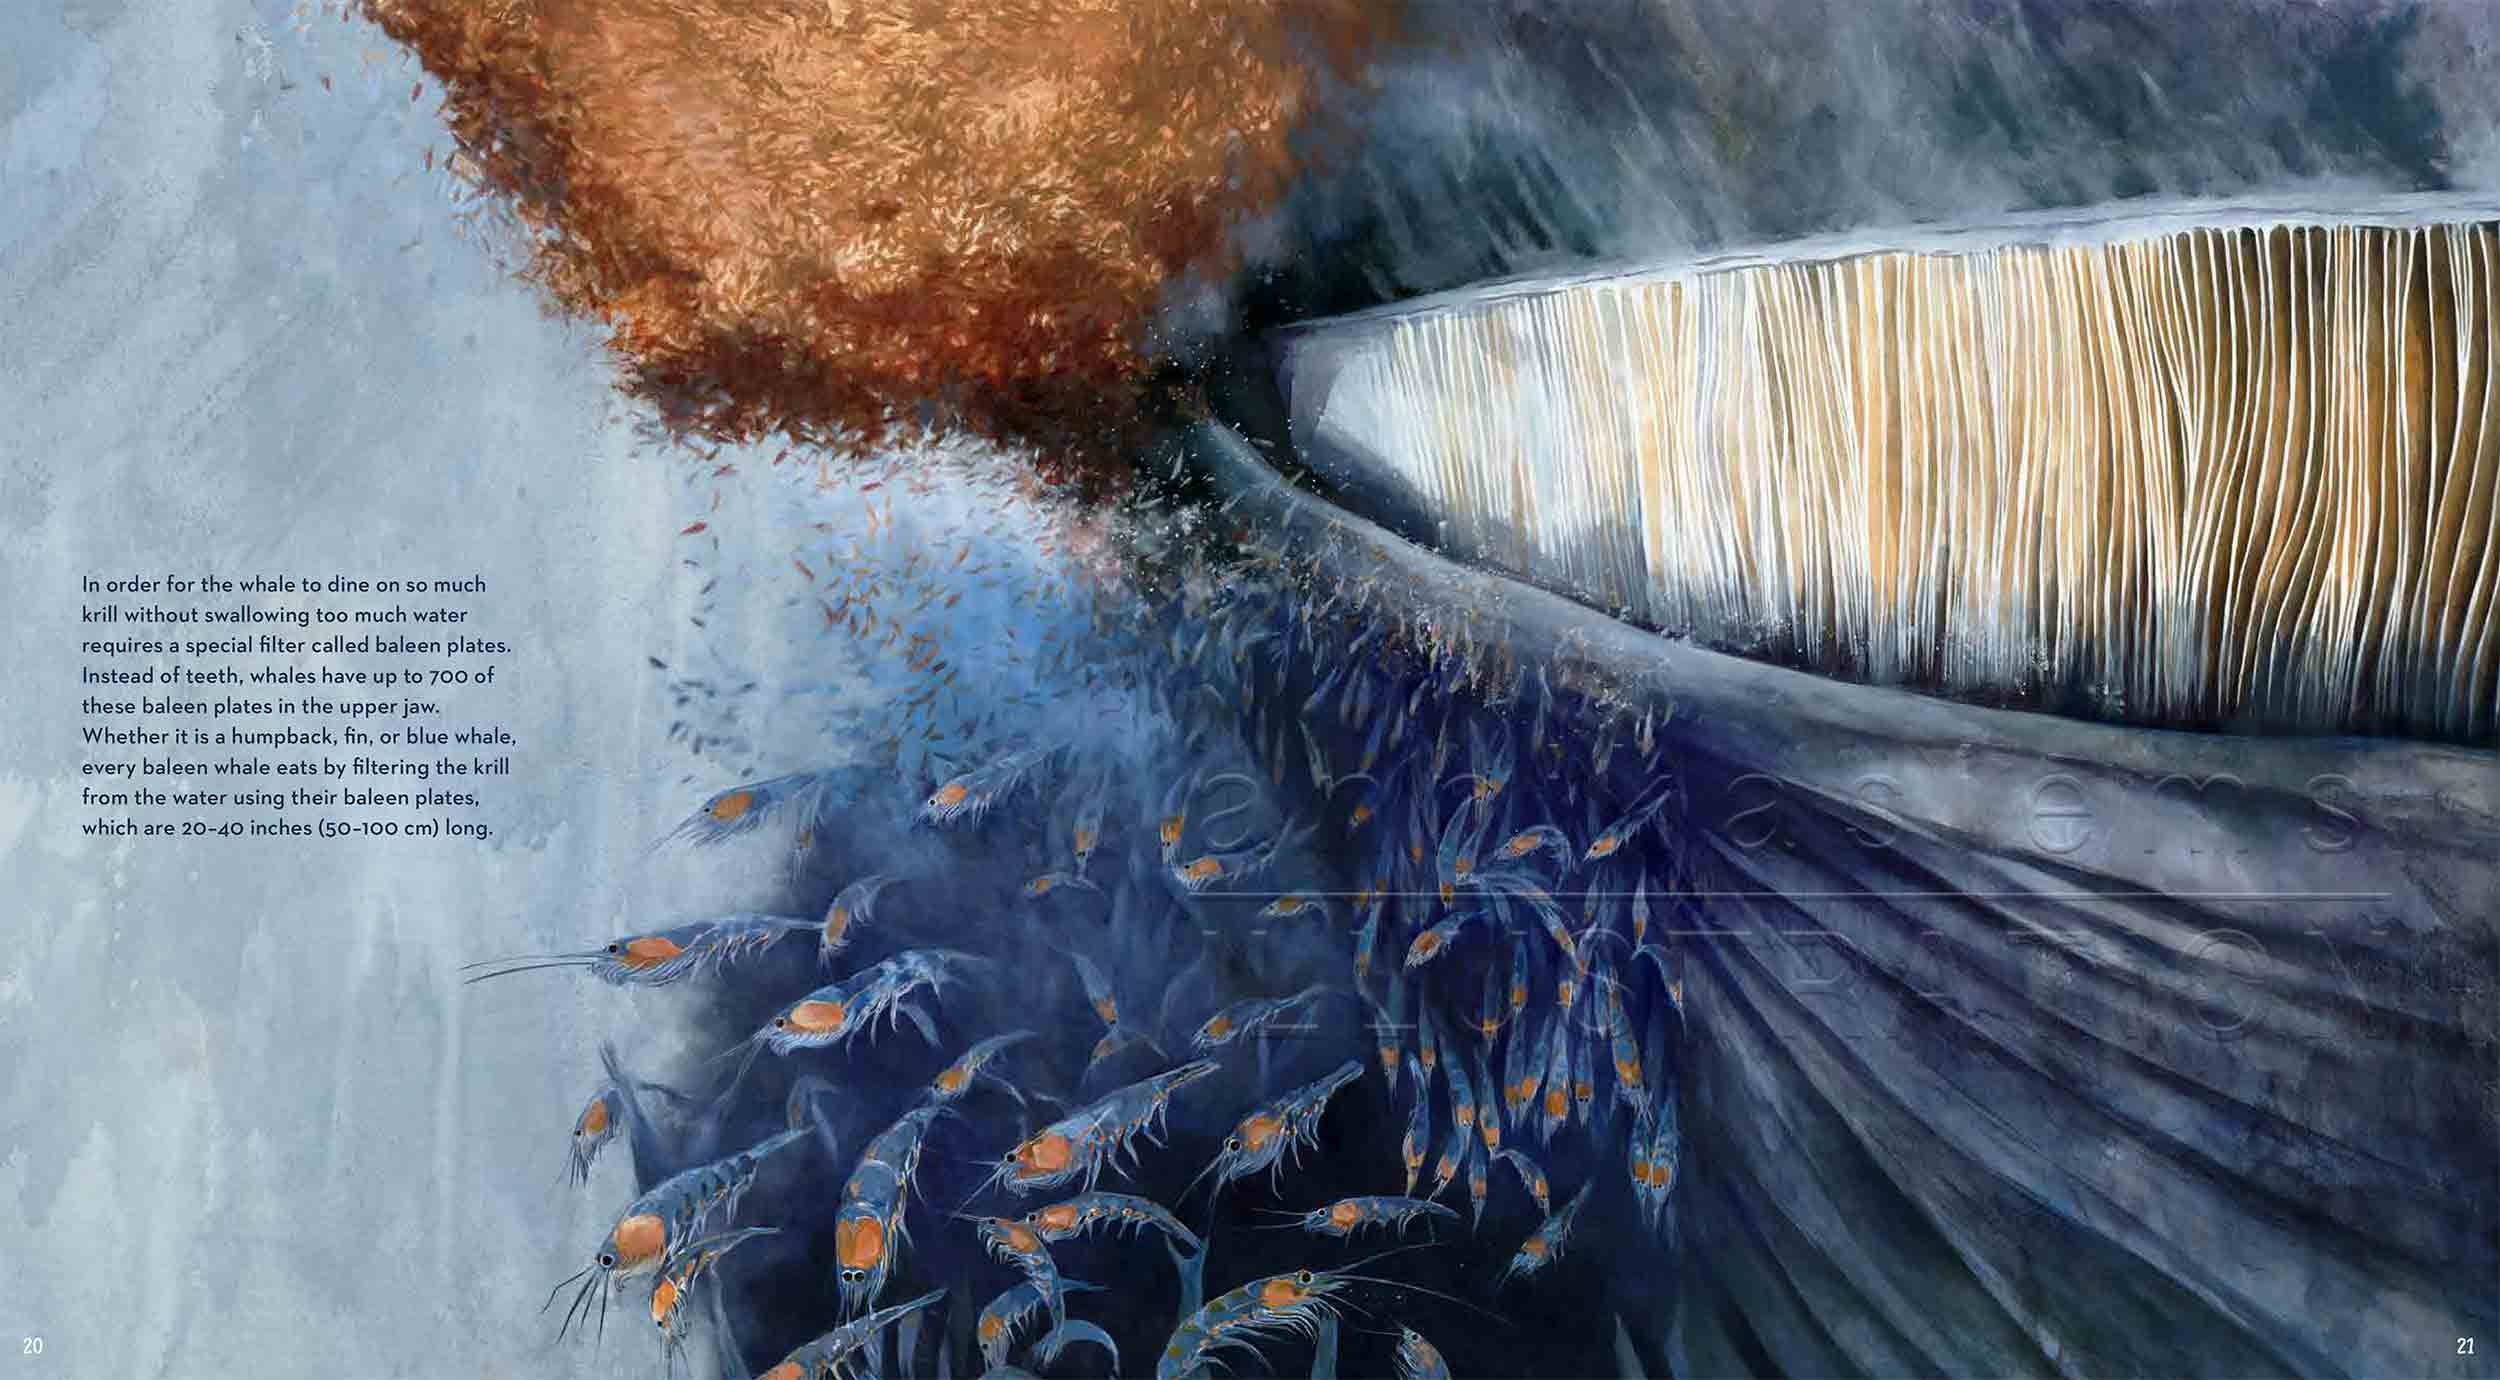 20-21deep-sea-Englisch-bluewhale-krill-©annikasiems-plankton_deepsea-zooplankton.jpg